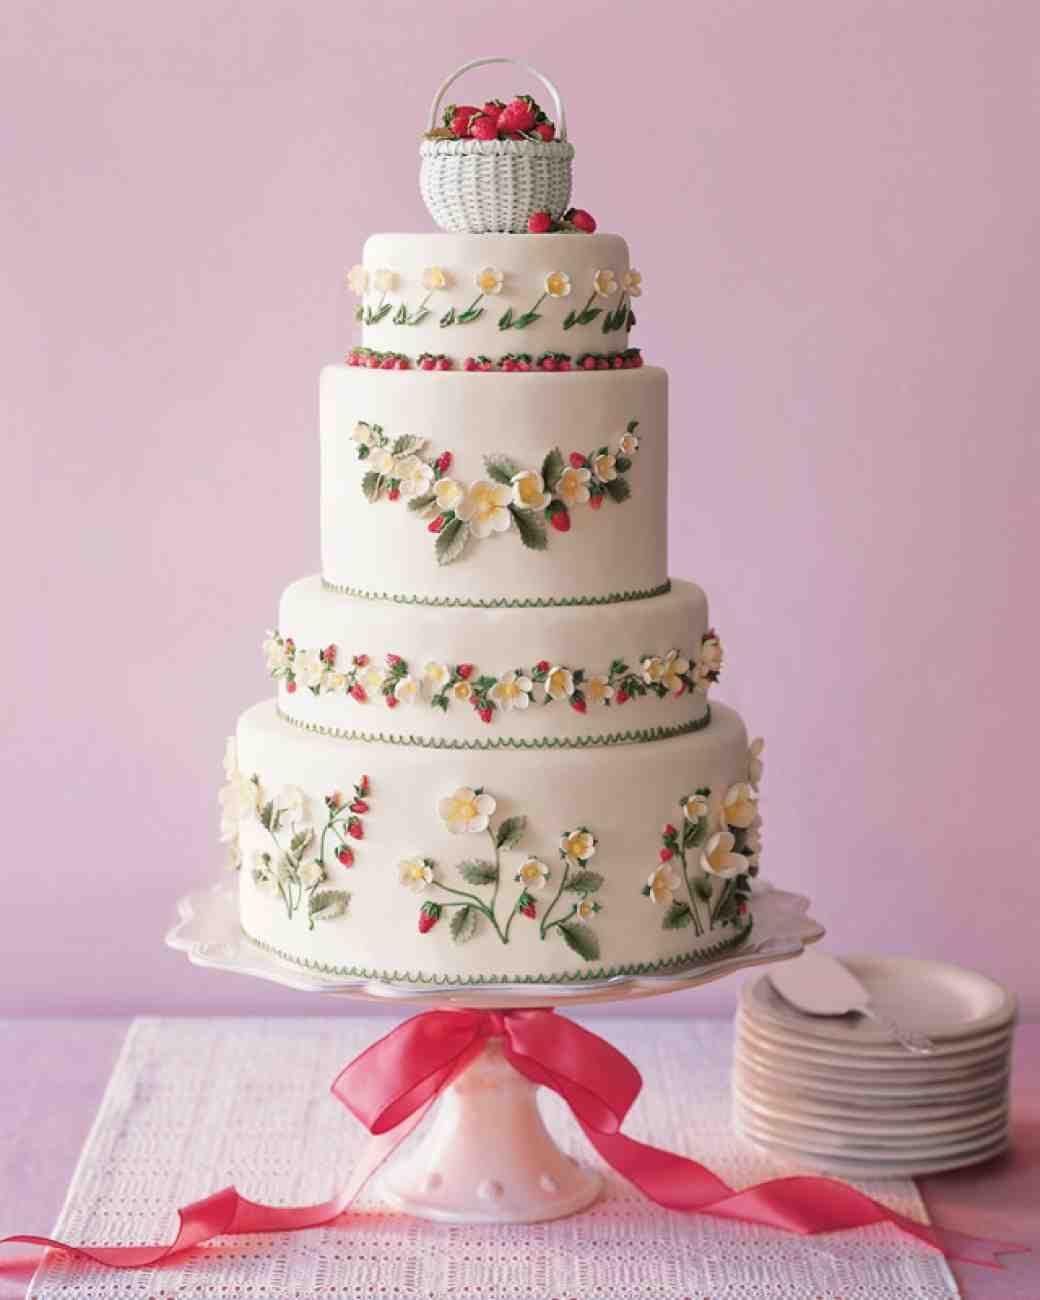 Strawberry Wedding Cake Recipe Wheatfields   Google Search